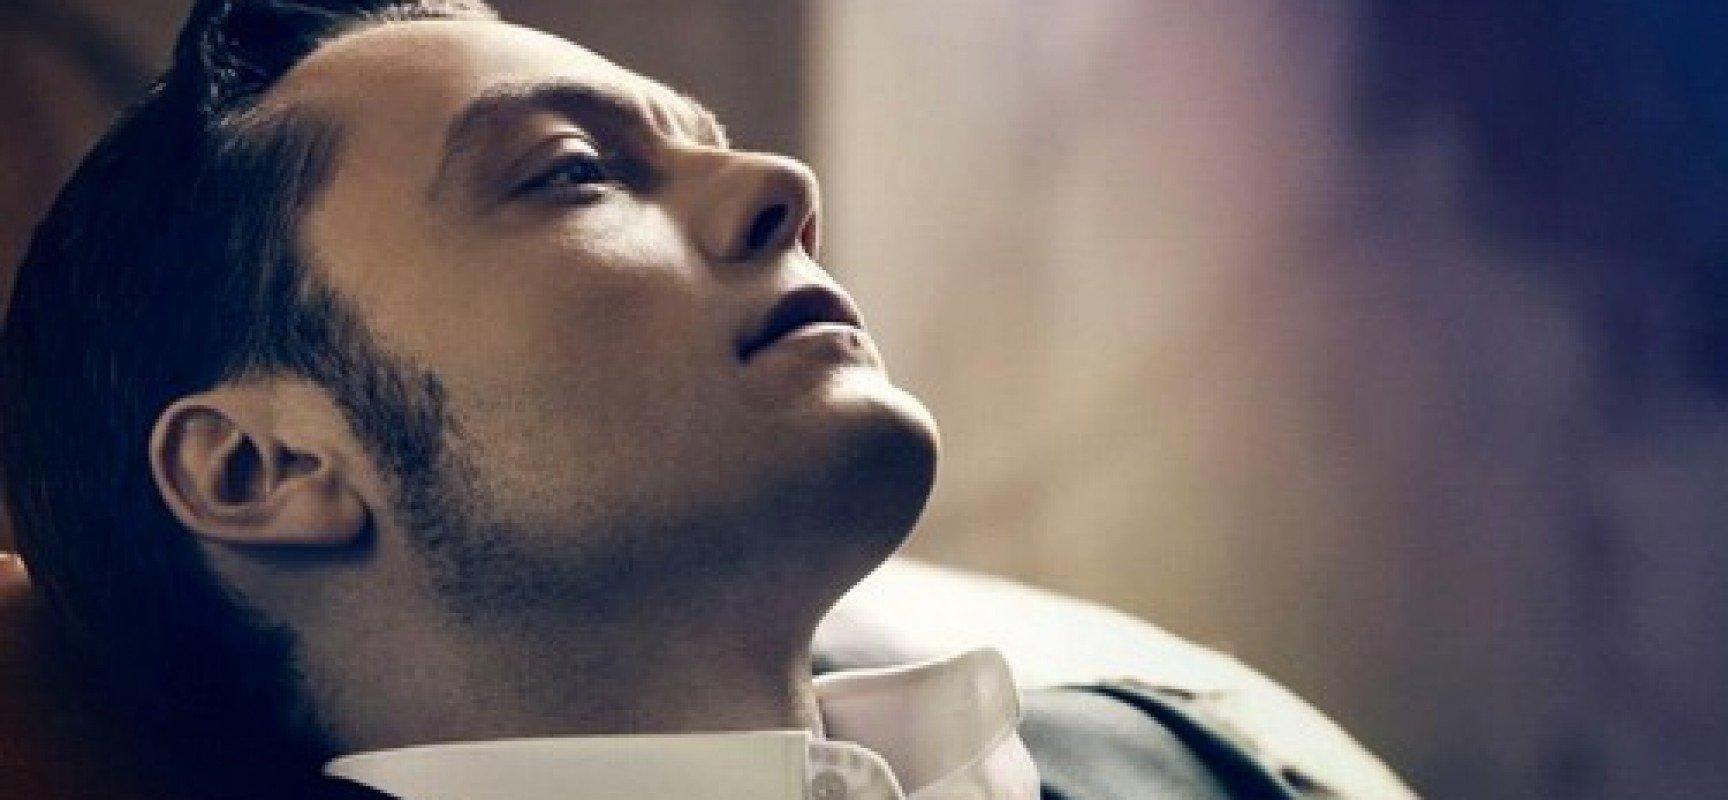 Tiziano Ferro: Sirmionewedding